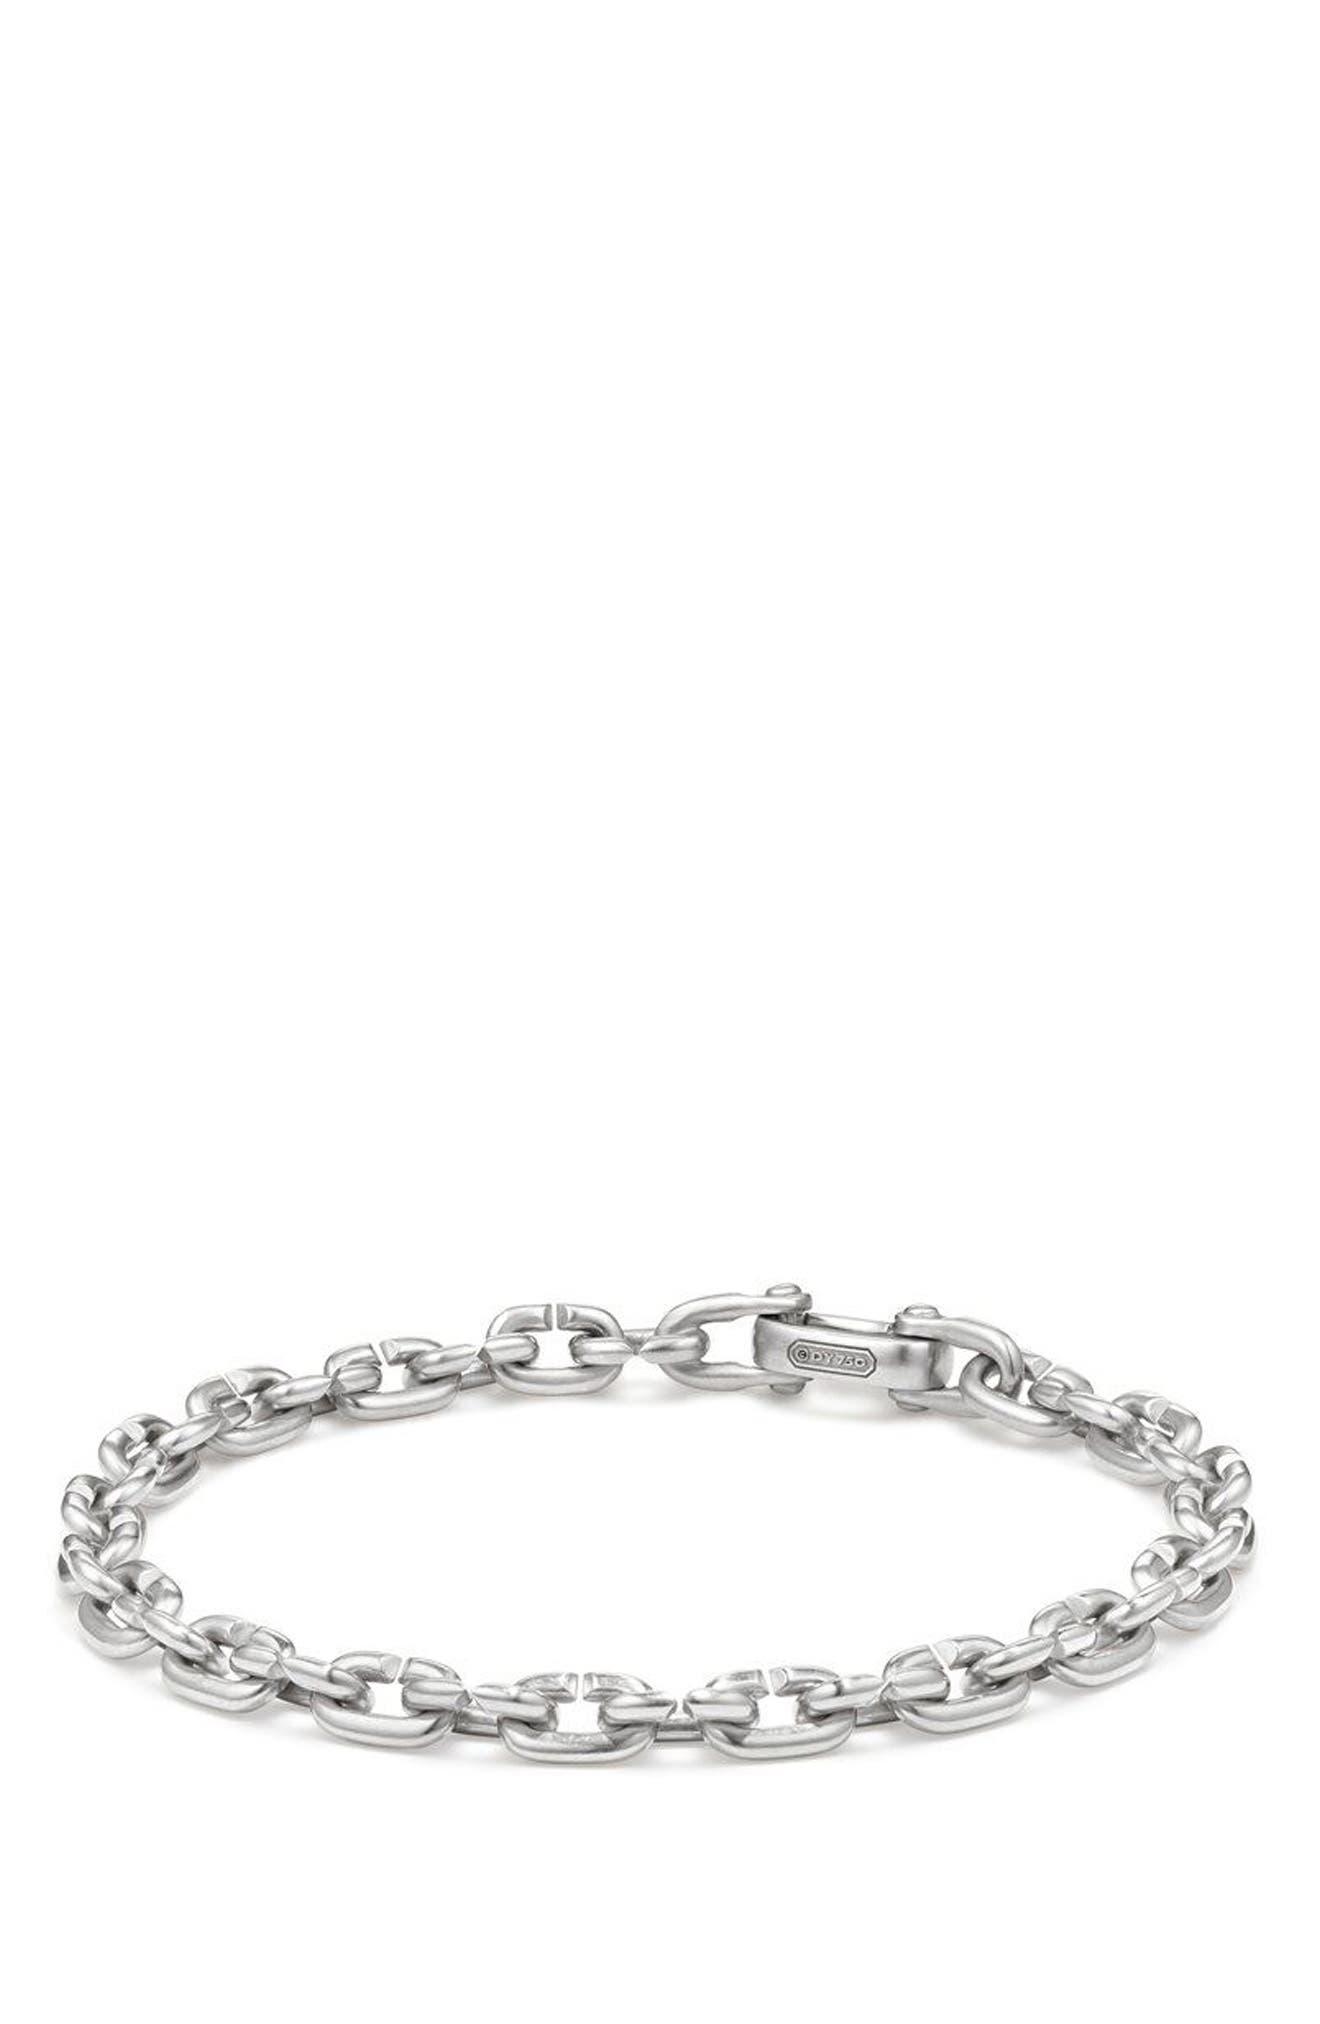 Narrow Chain Link Bracelet,                             Main thumbnail 1, color,                             SILVER